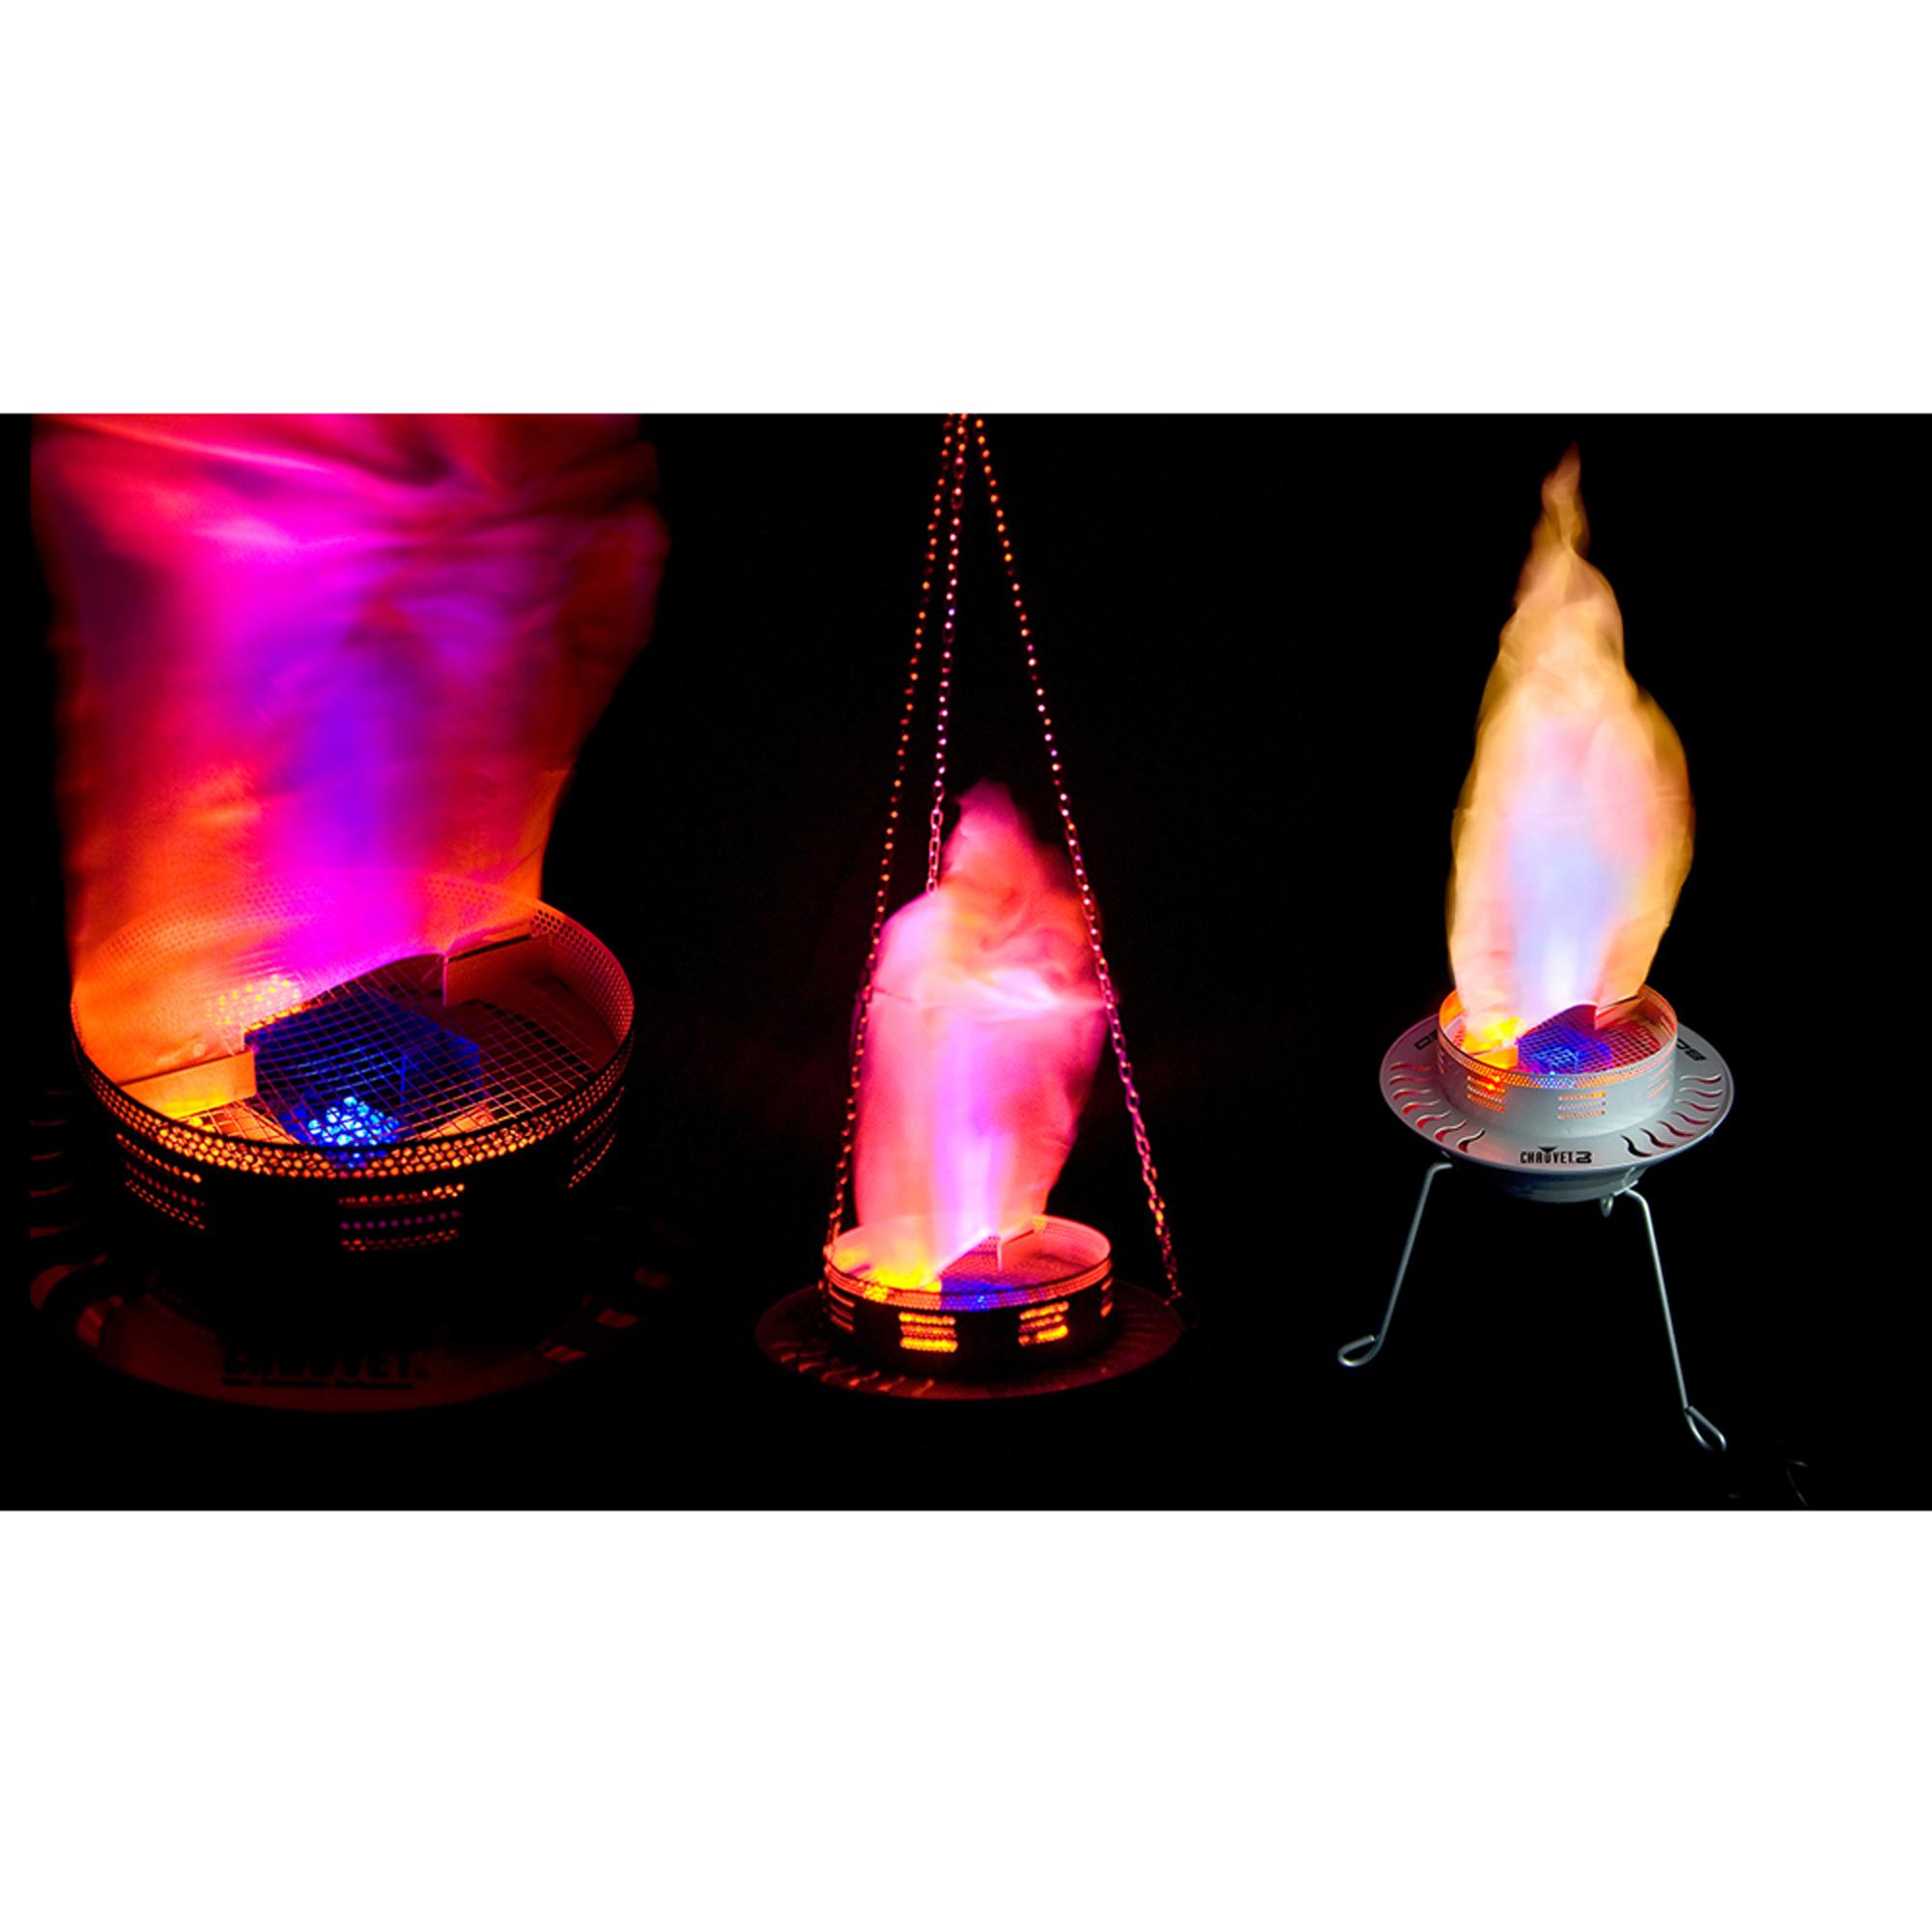 Chauvet Dj Bob Led Hanging Chain Amp Legs Fire Flame